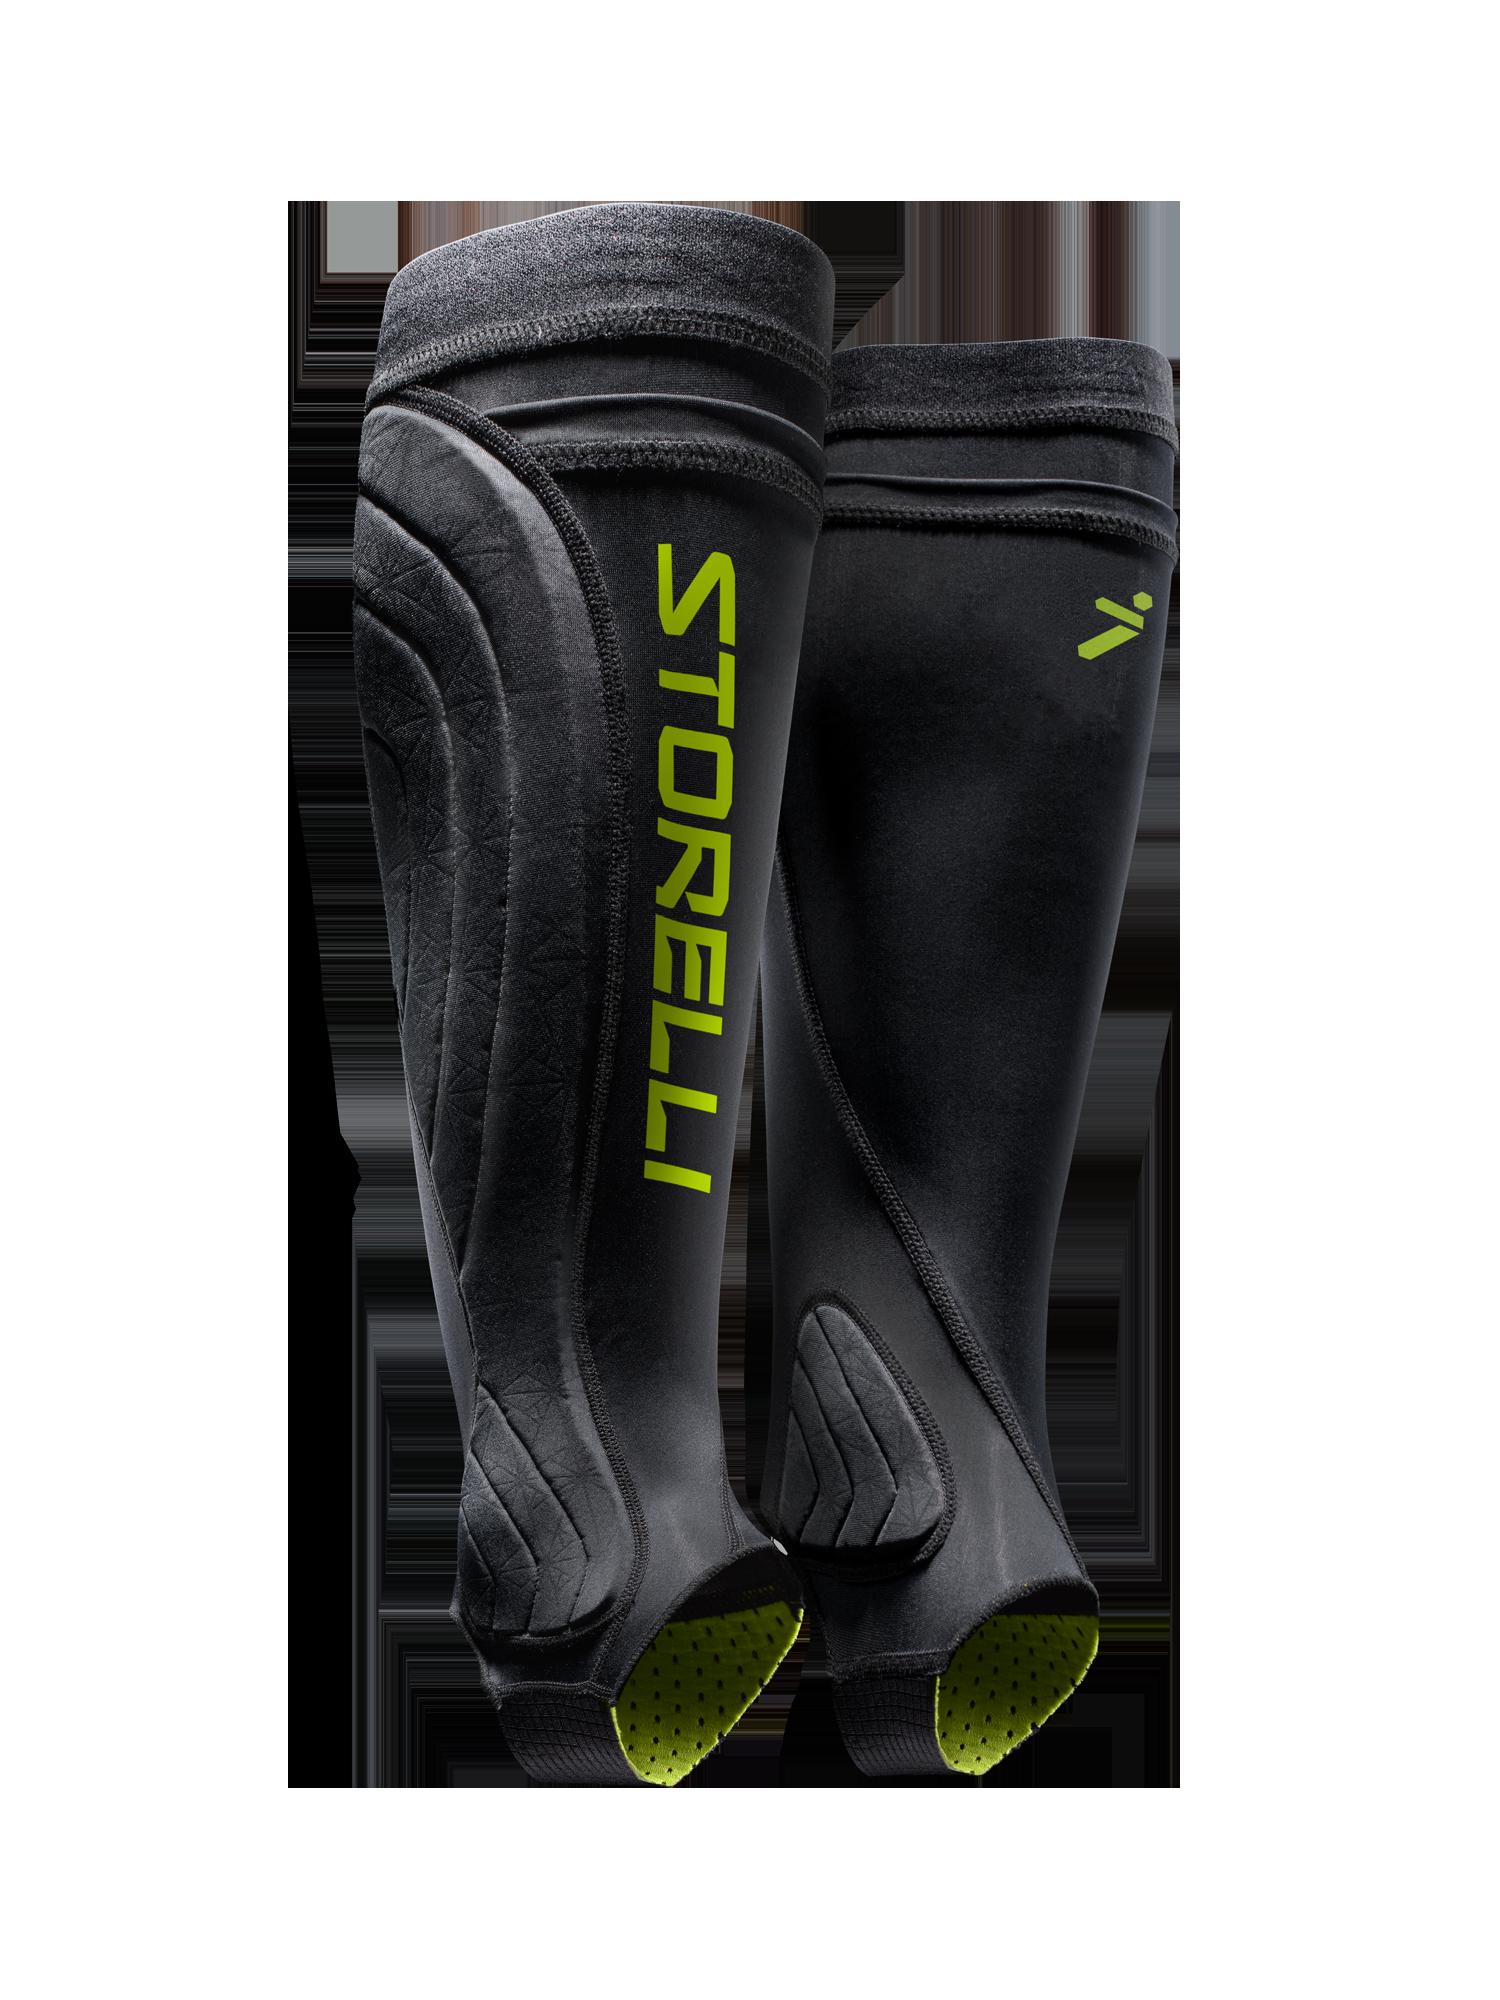 Storelli Leg Guards